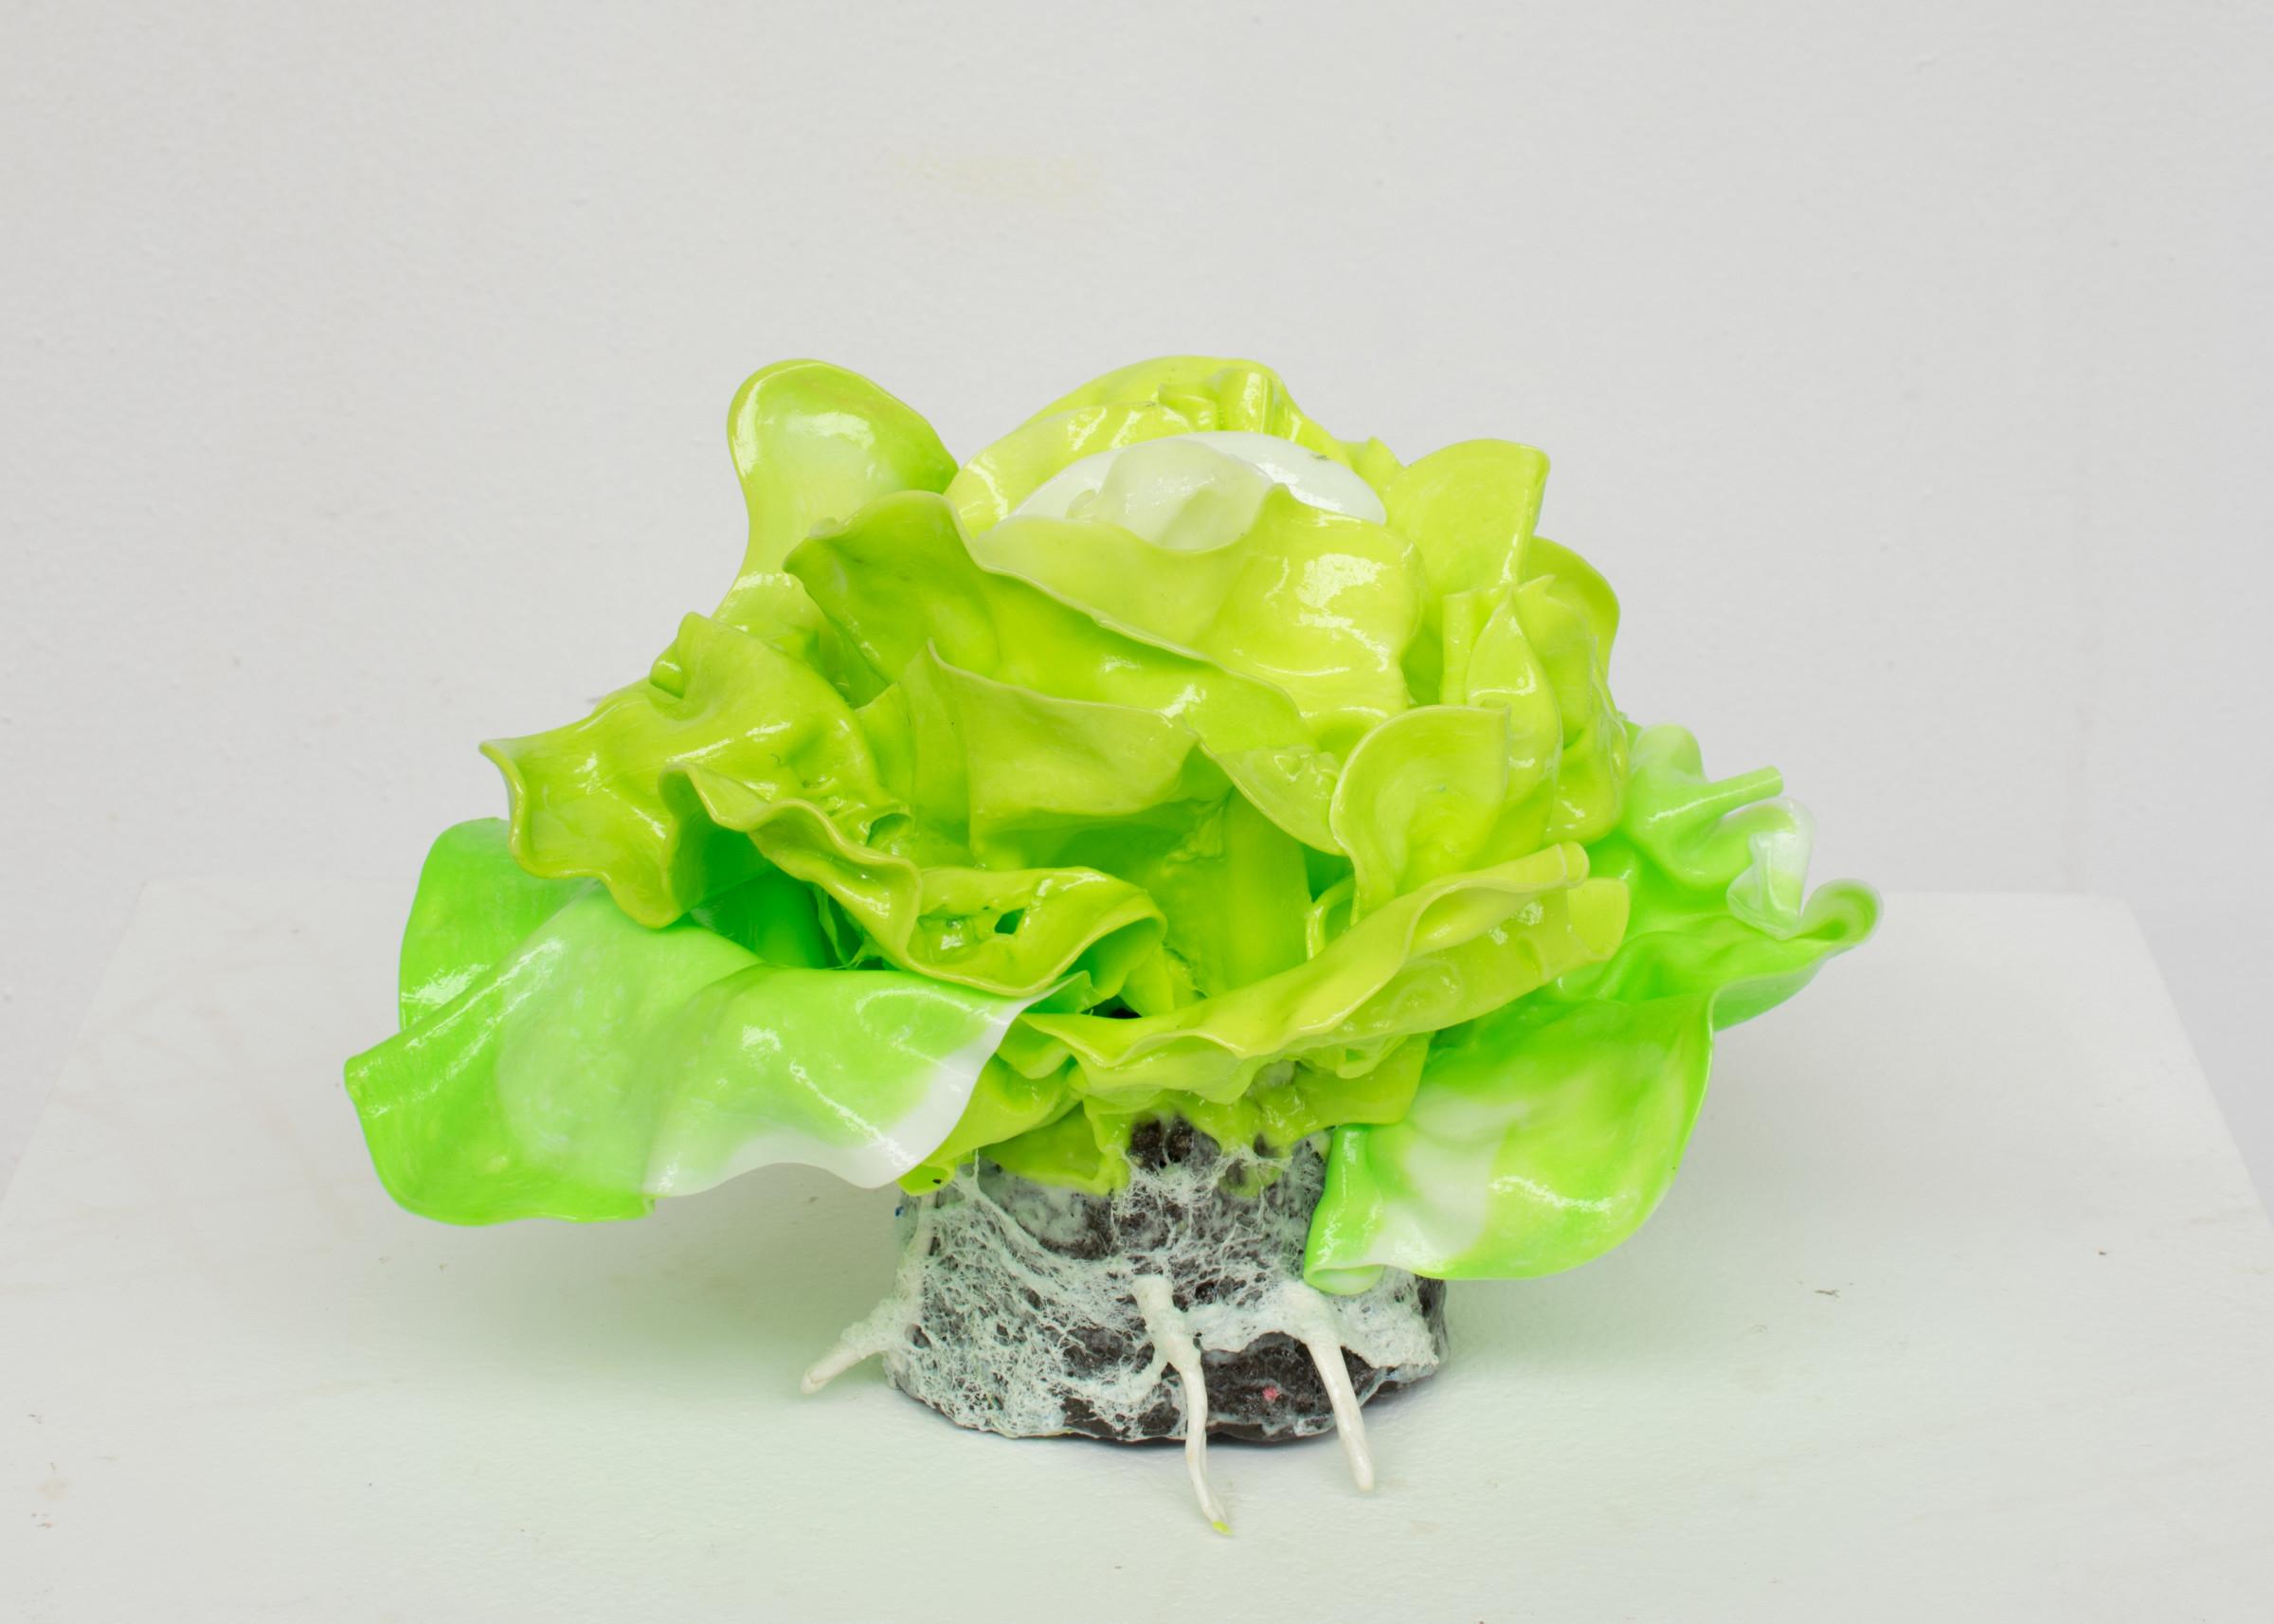 "<span class=""link fancybox-details-link""><a href=""/artists/42-stefan-gross/works/5379-stefan-gross-lettuce-small-2019/"">View Detail Page</a></span><div class=""artist""><strong>Stefan Gross</strong></div> <div class=""title""><em>Lettuce small</em>, 2019</div> <div class=""medium"">Oil plastic</div> <div class=""dimensions"">25 x 25 x 25 cm<br /> 10 x 10 x 10 in</div><div class=""price"">€1,500.00</div>"